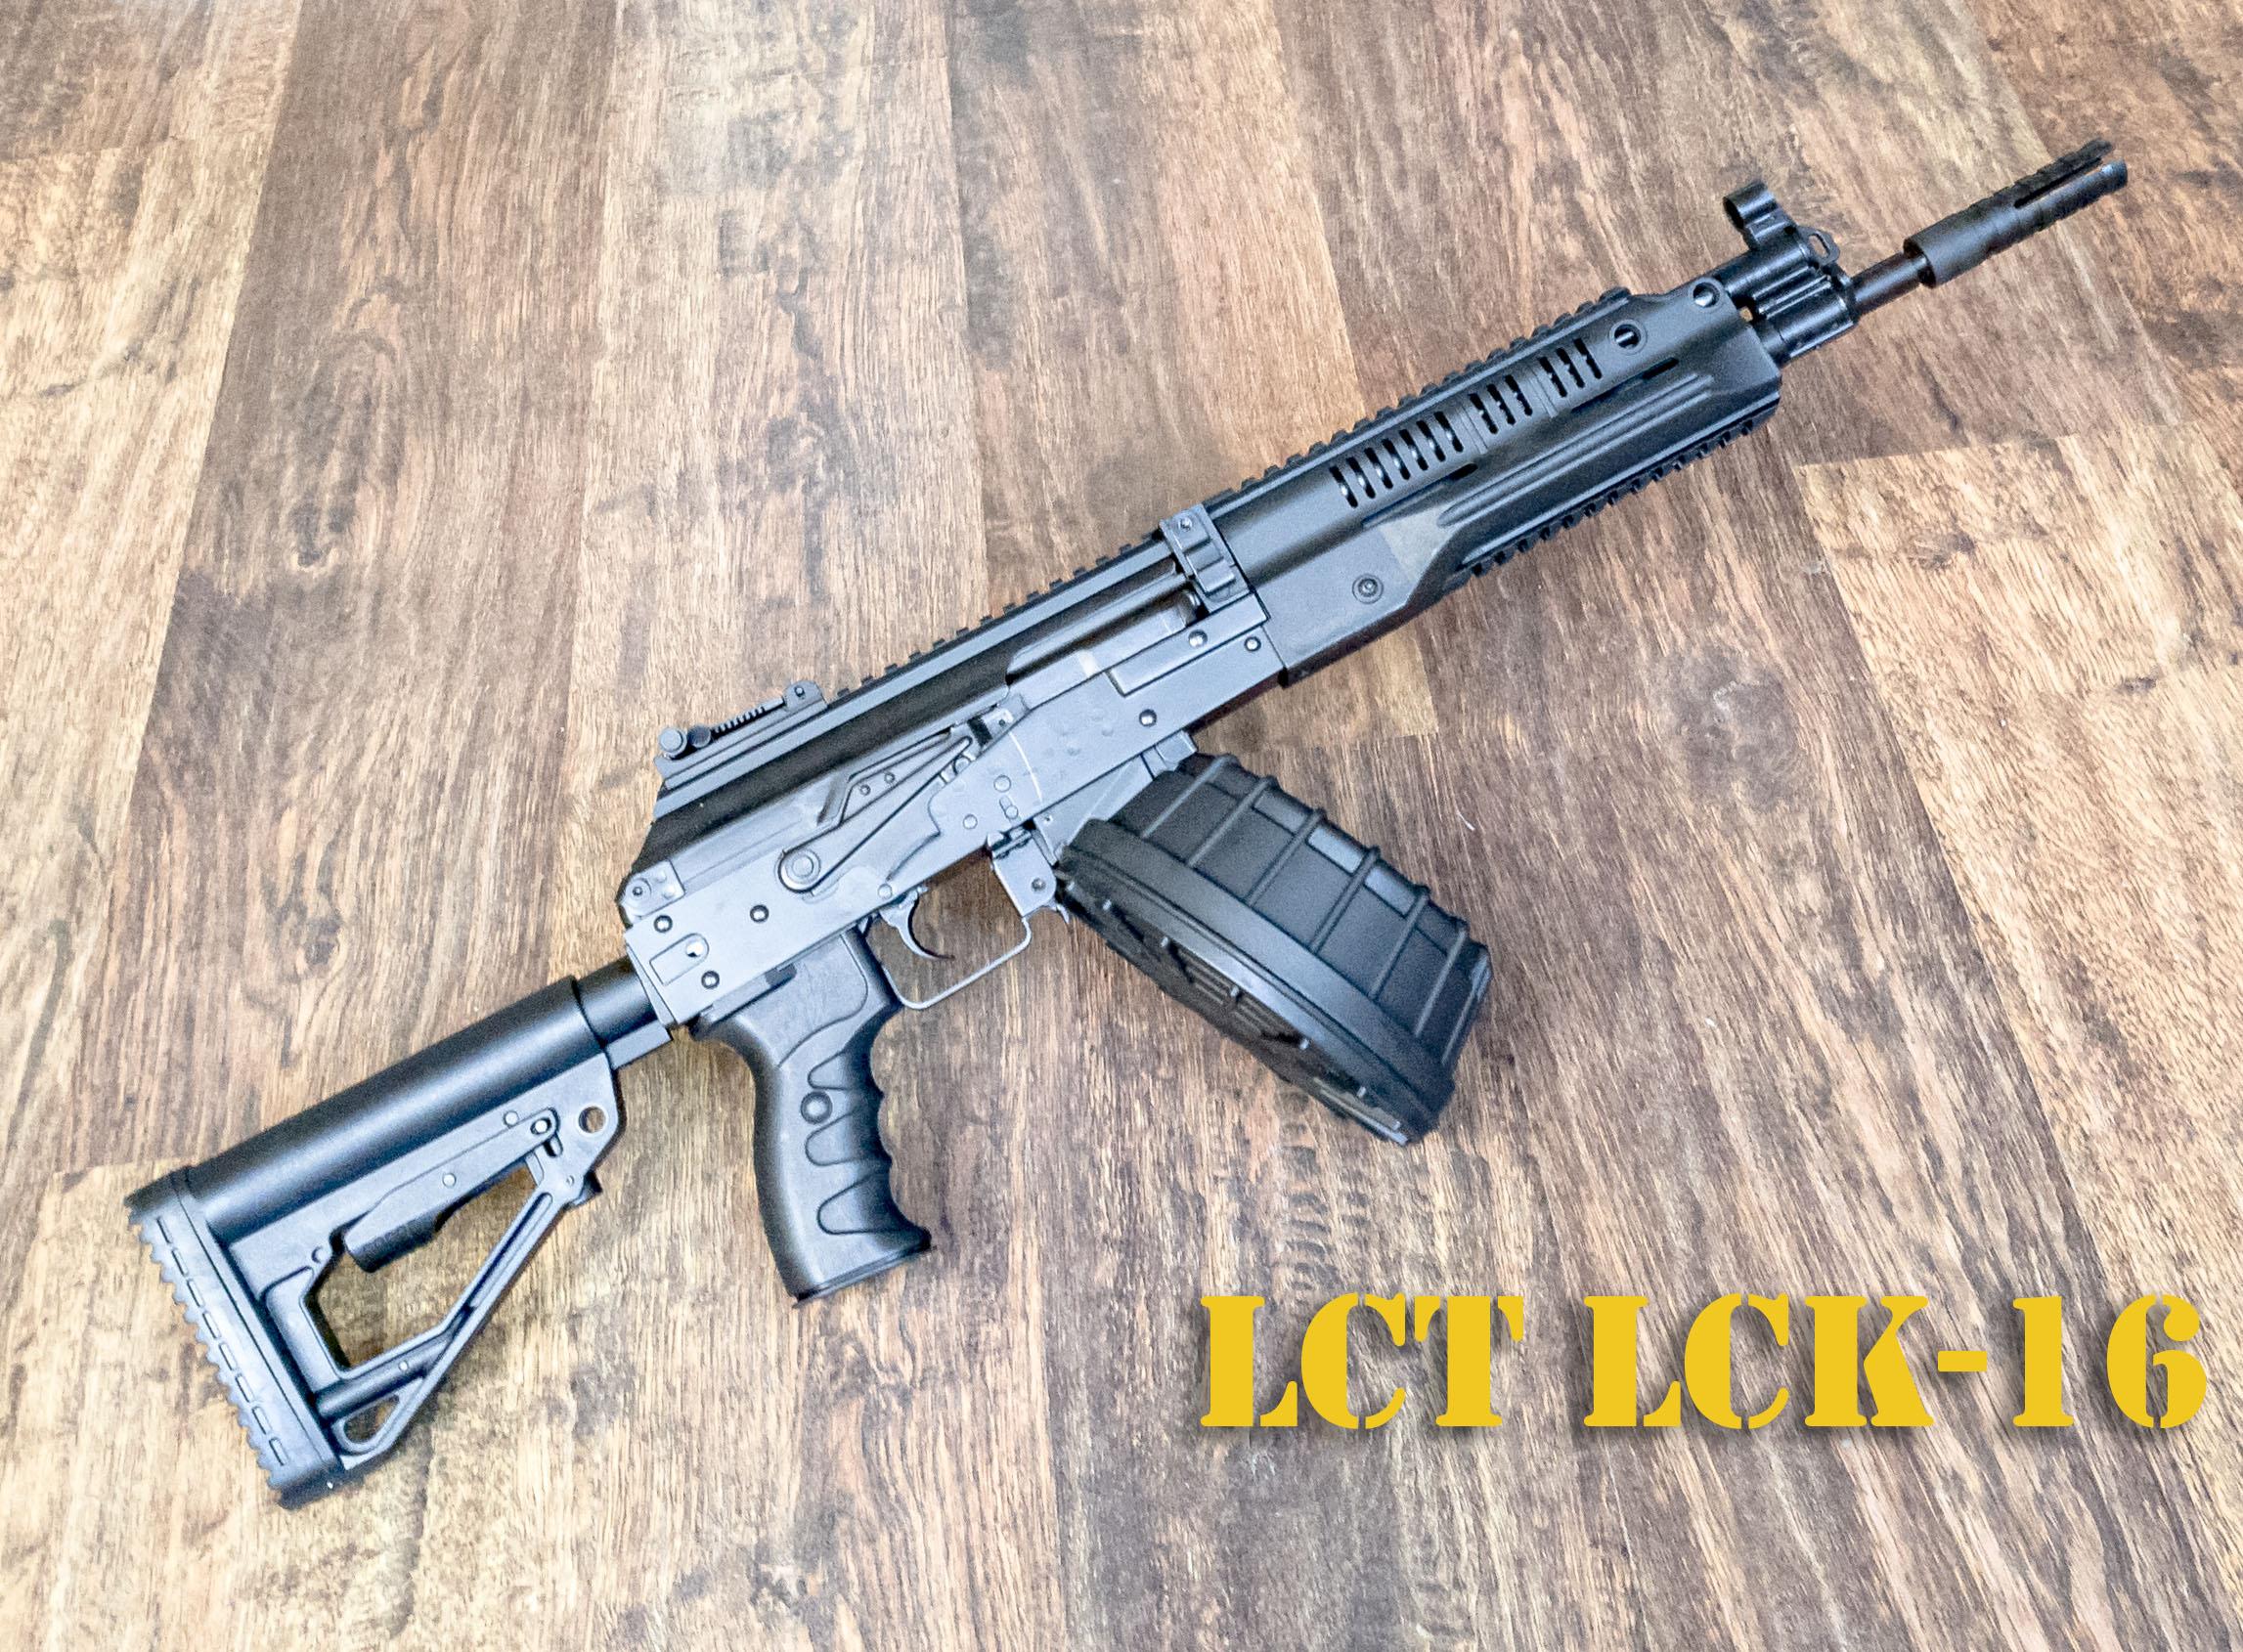 lck-16.jpg